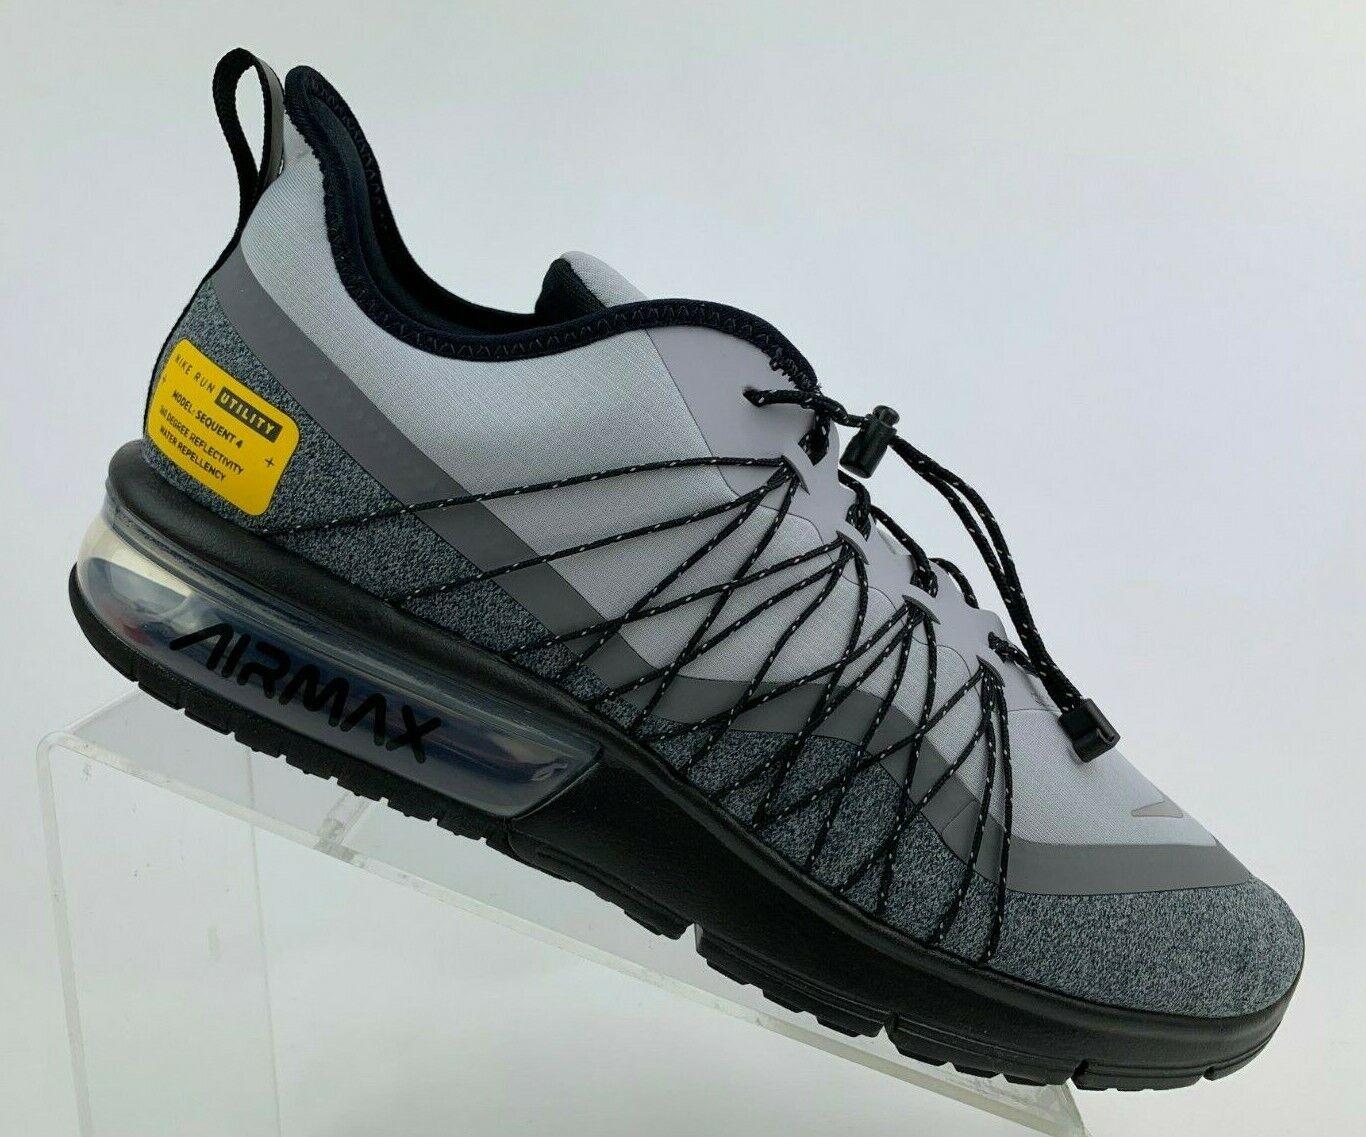 Nike Air Max Sequent 4 Shield Running Shoes Khaki Maroon